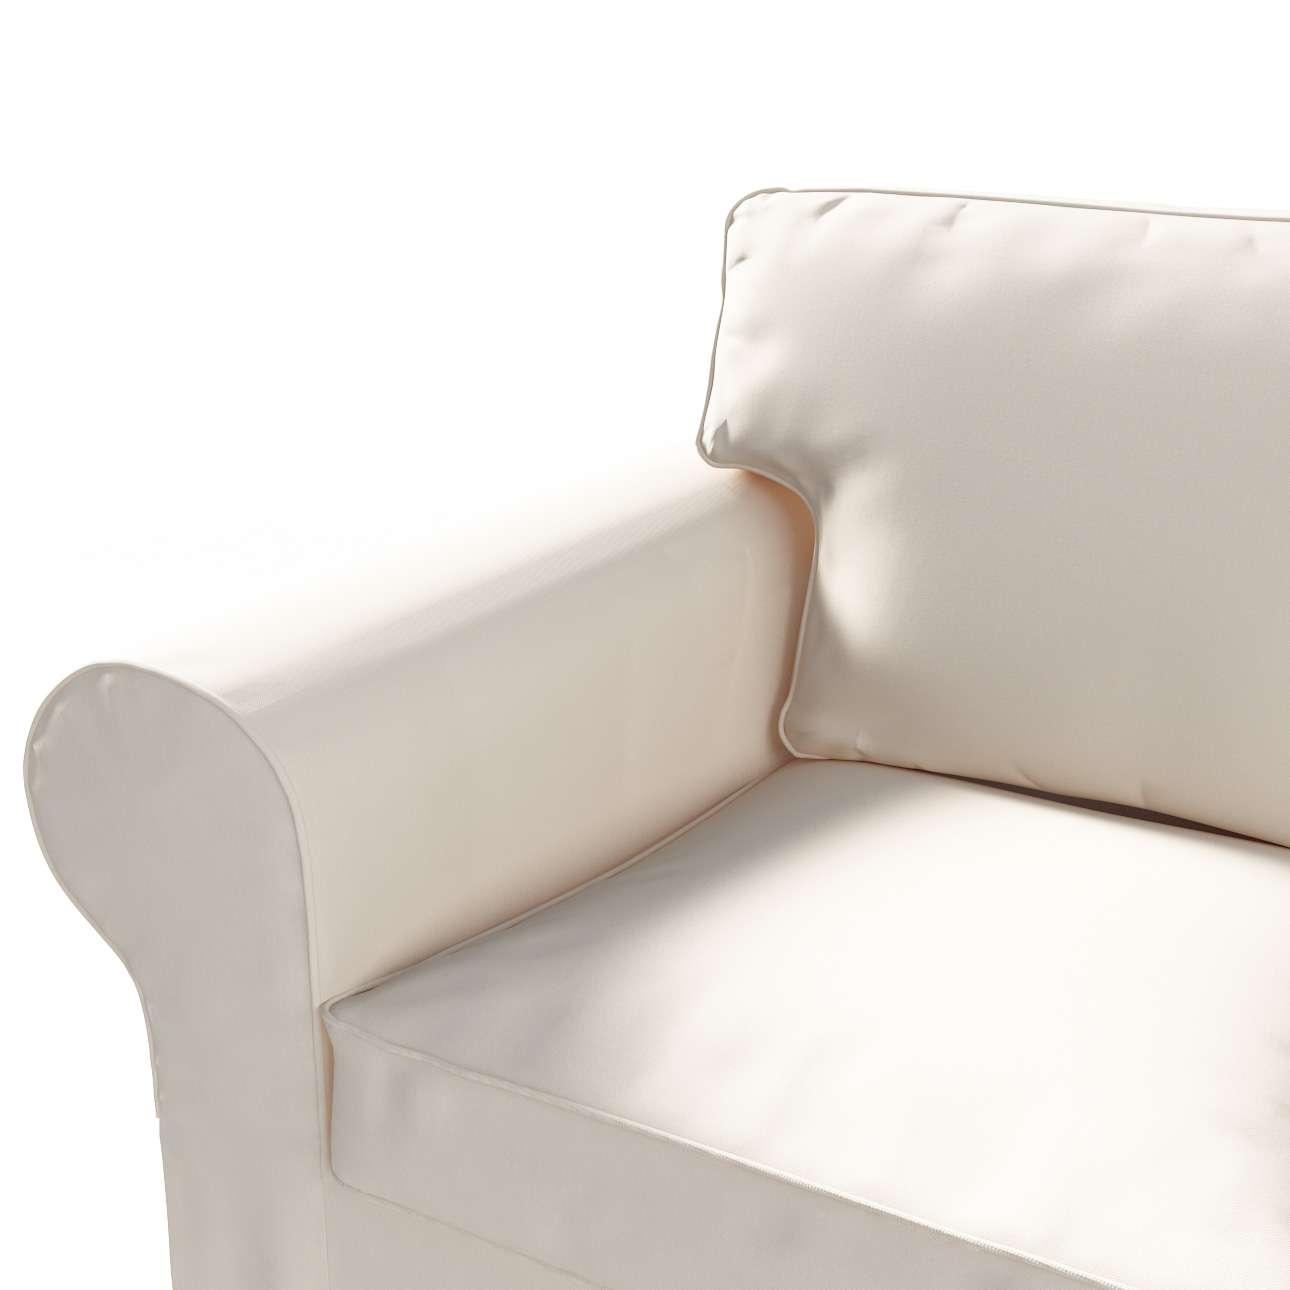 Ektorp 3-Sitzer Schlafsofabezug neues Modell (2013) Ektorp 3-Sitzer, ausklappbar, neues Modell ( 2013) von der Kollektion Etna, Stoff: 705-01